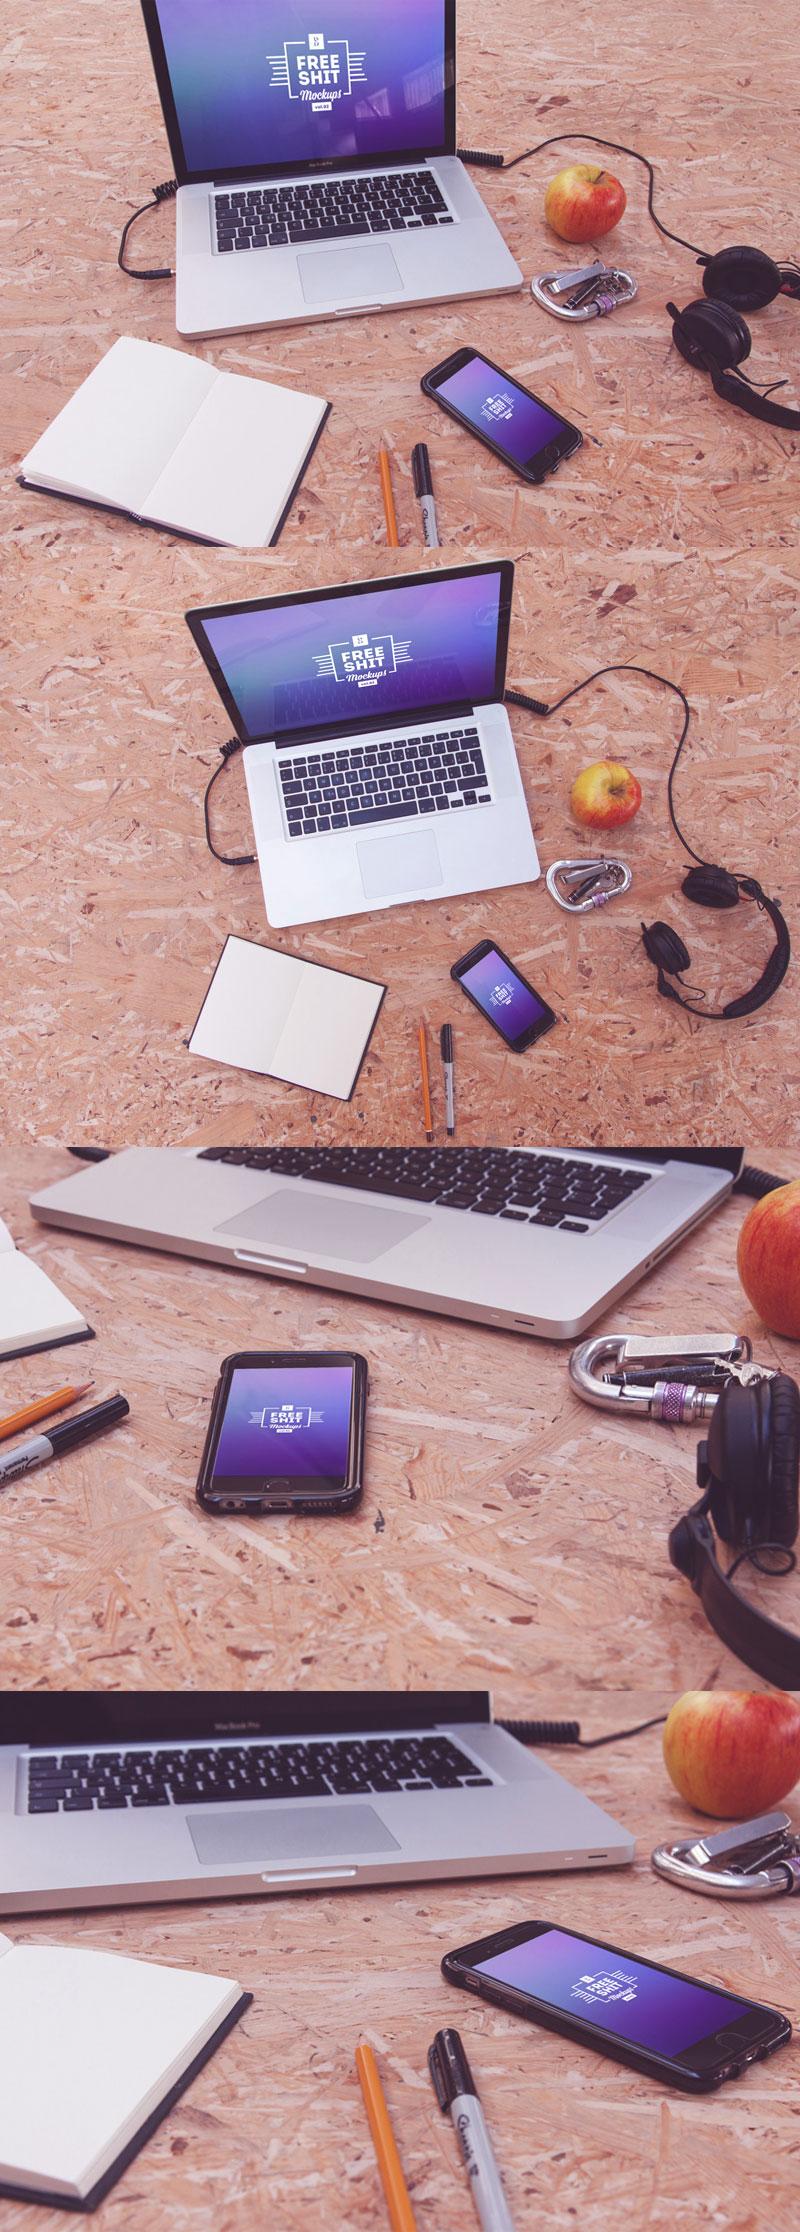 iPhone-and-Macbook-Mockups